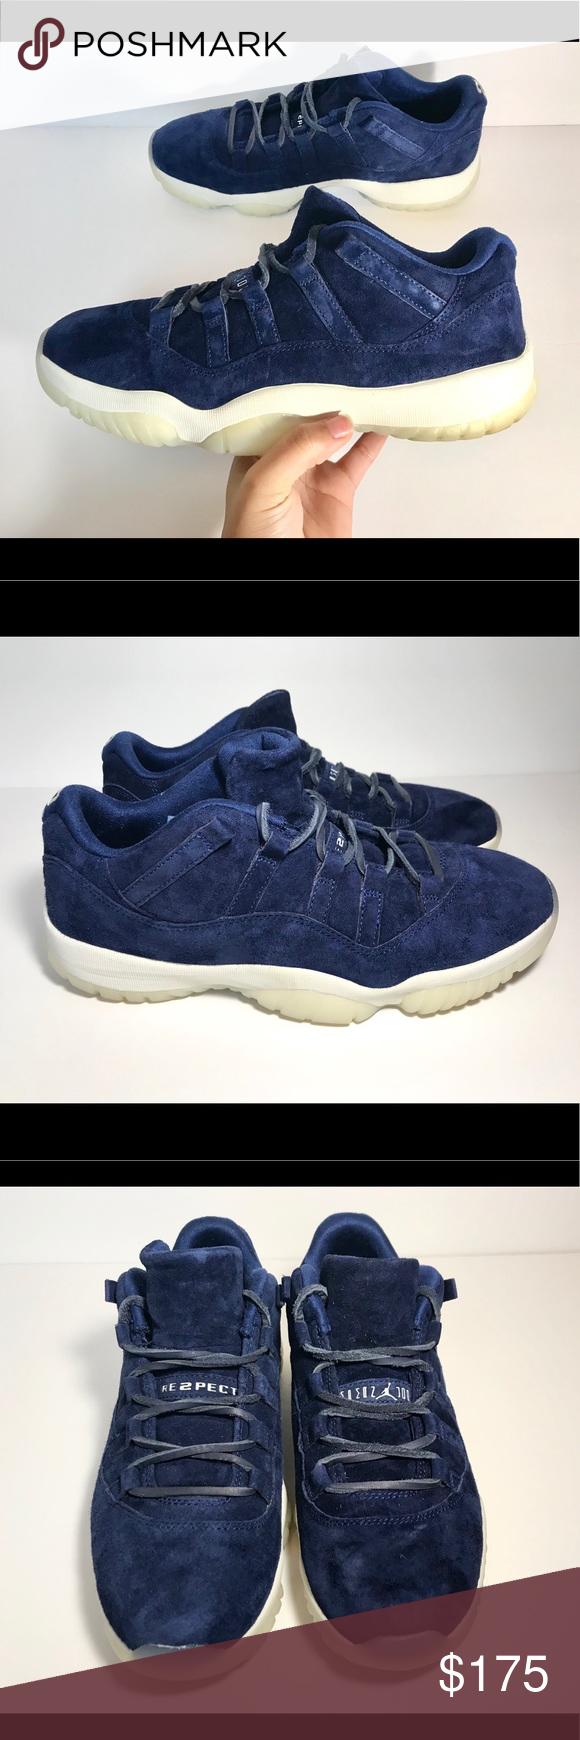 6249f174ff75c0 Nike Air Jordan 11 Low Retro RE2PECT Jeter Size 9.5 in men Excellent  condition No odor